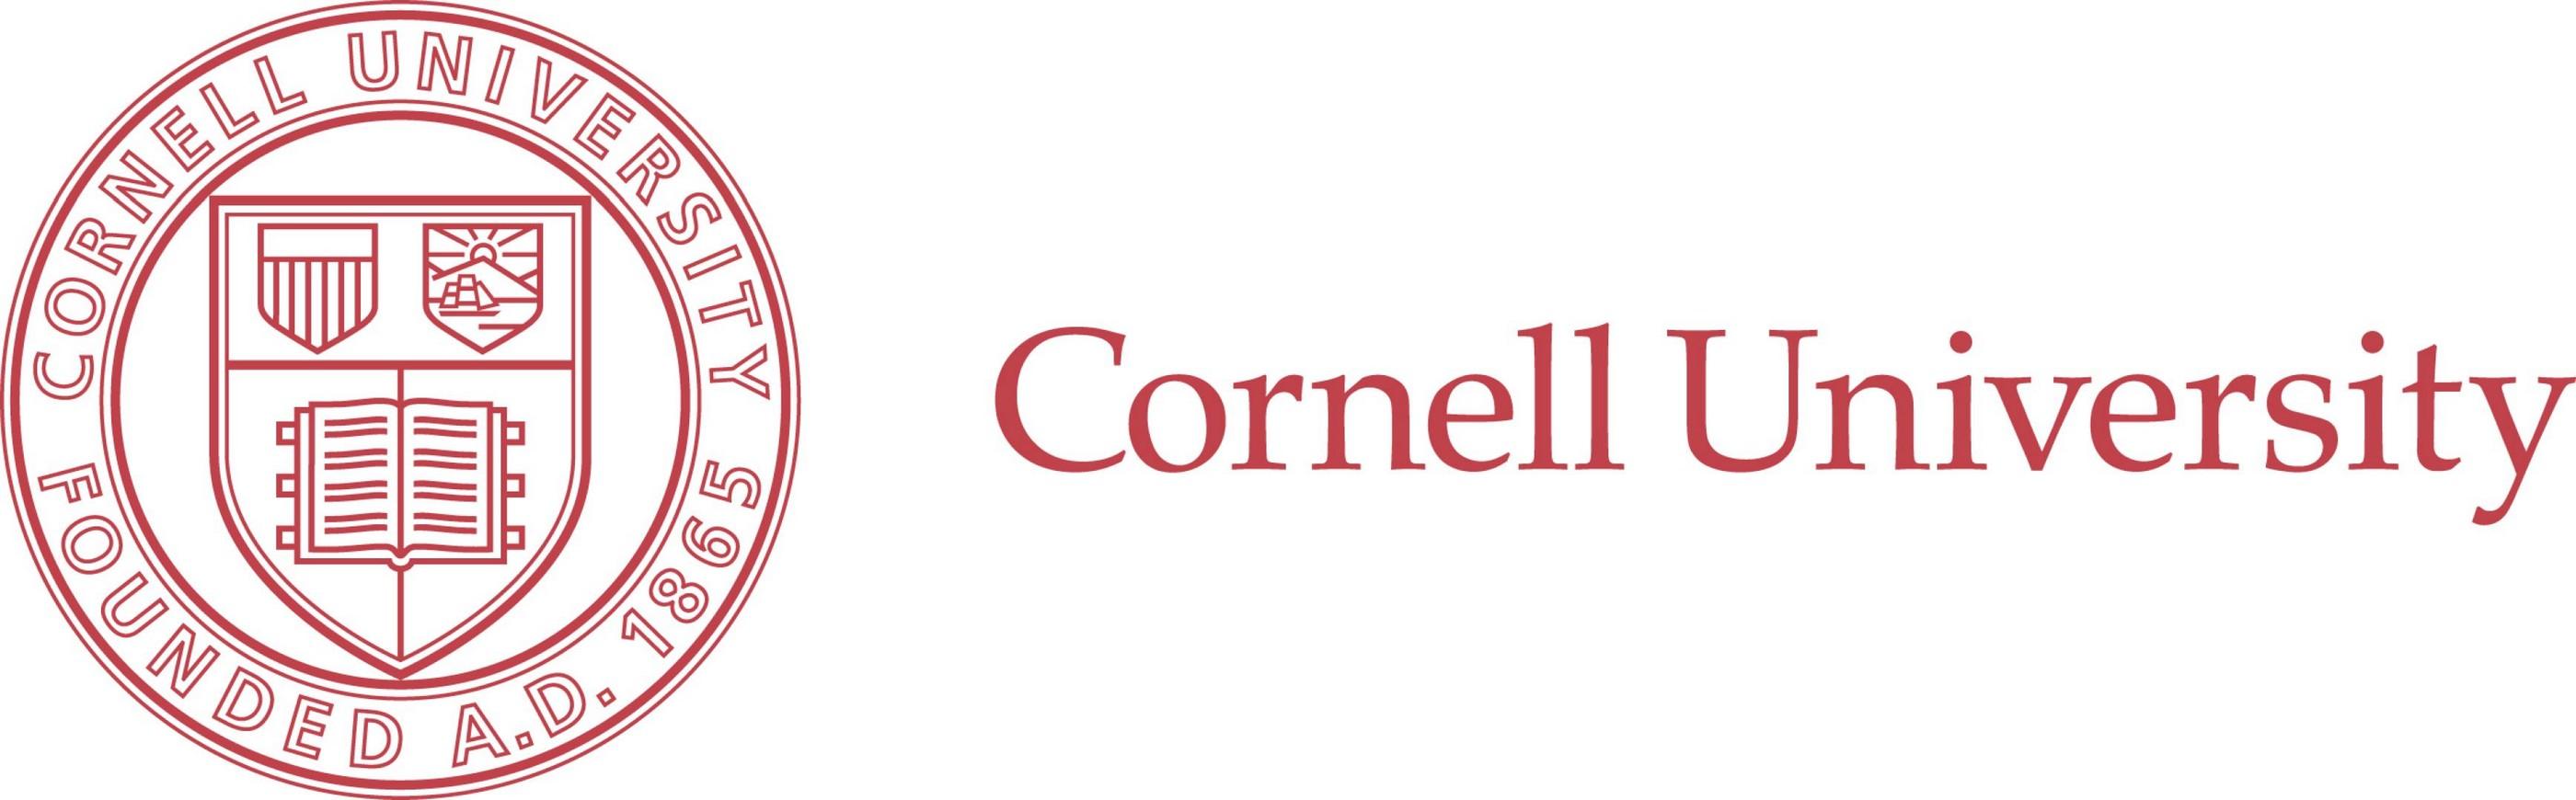 Cornell University Logo Clipart.